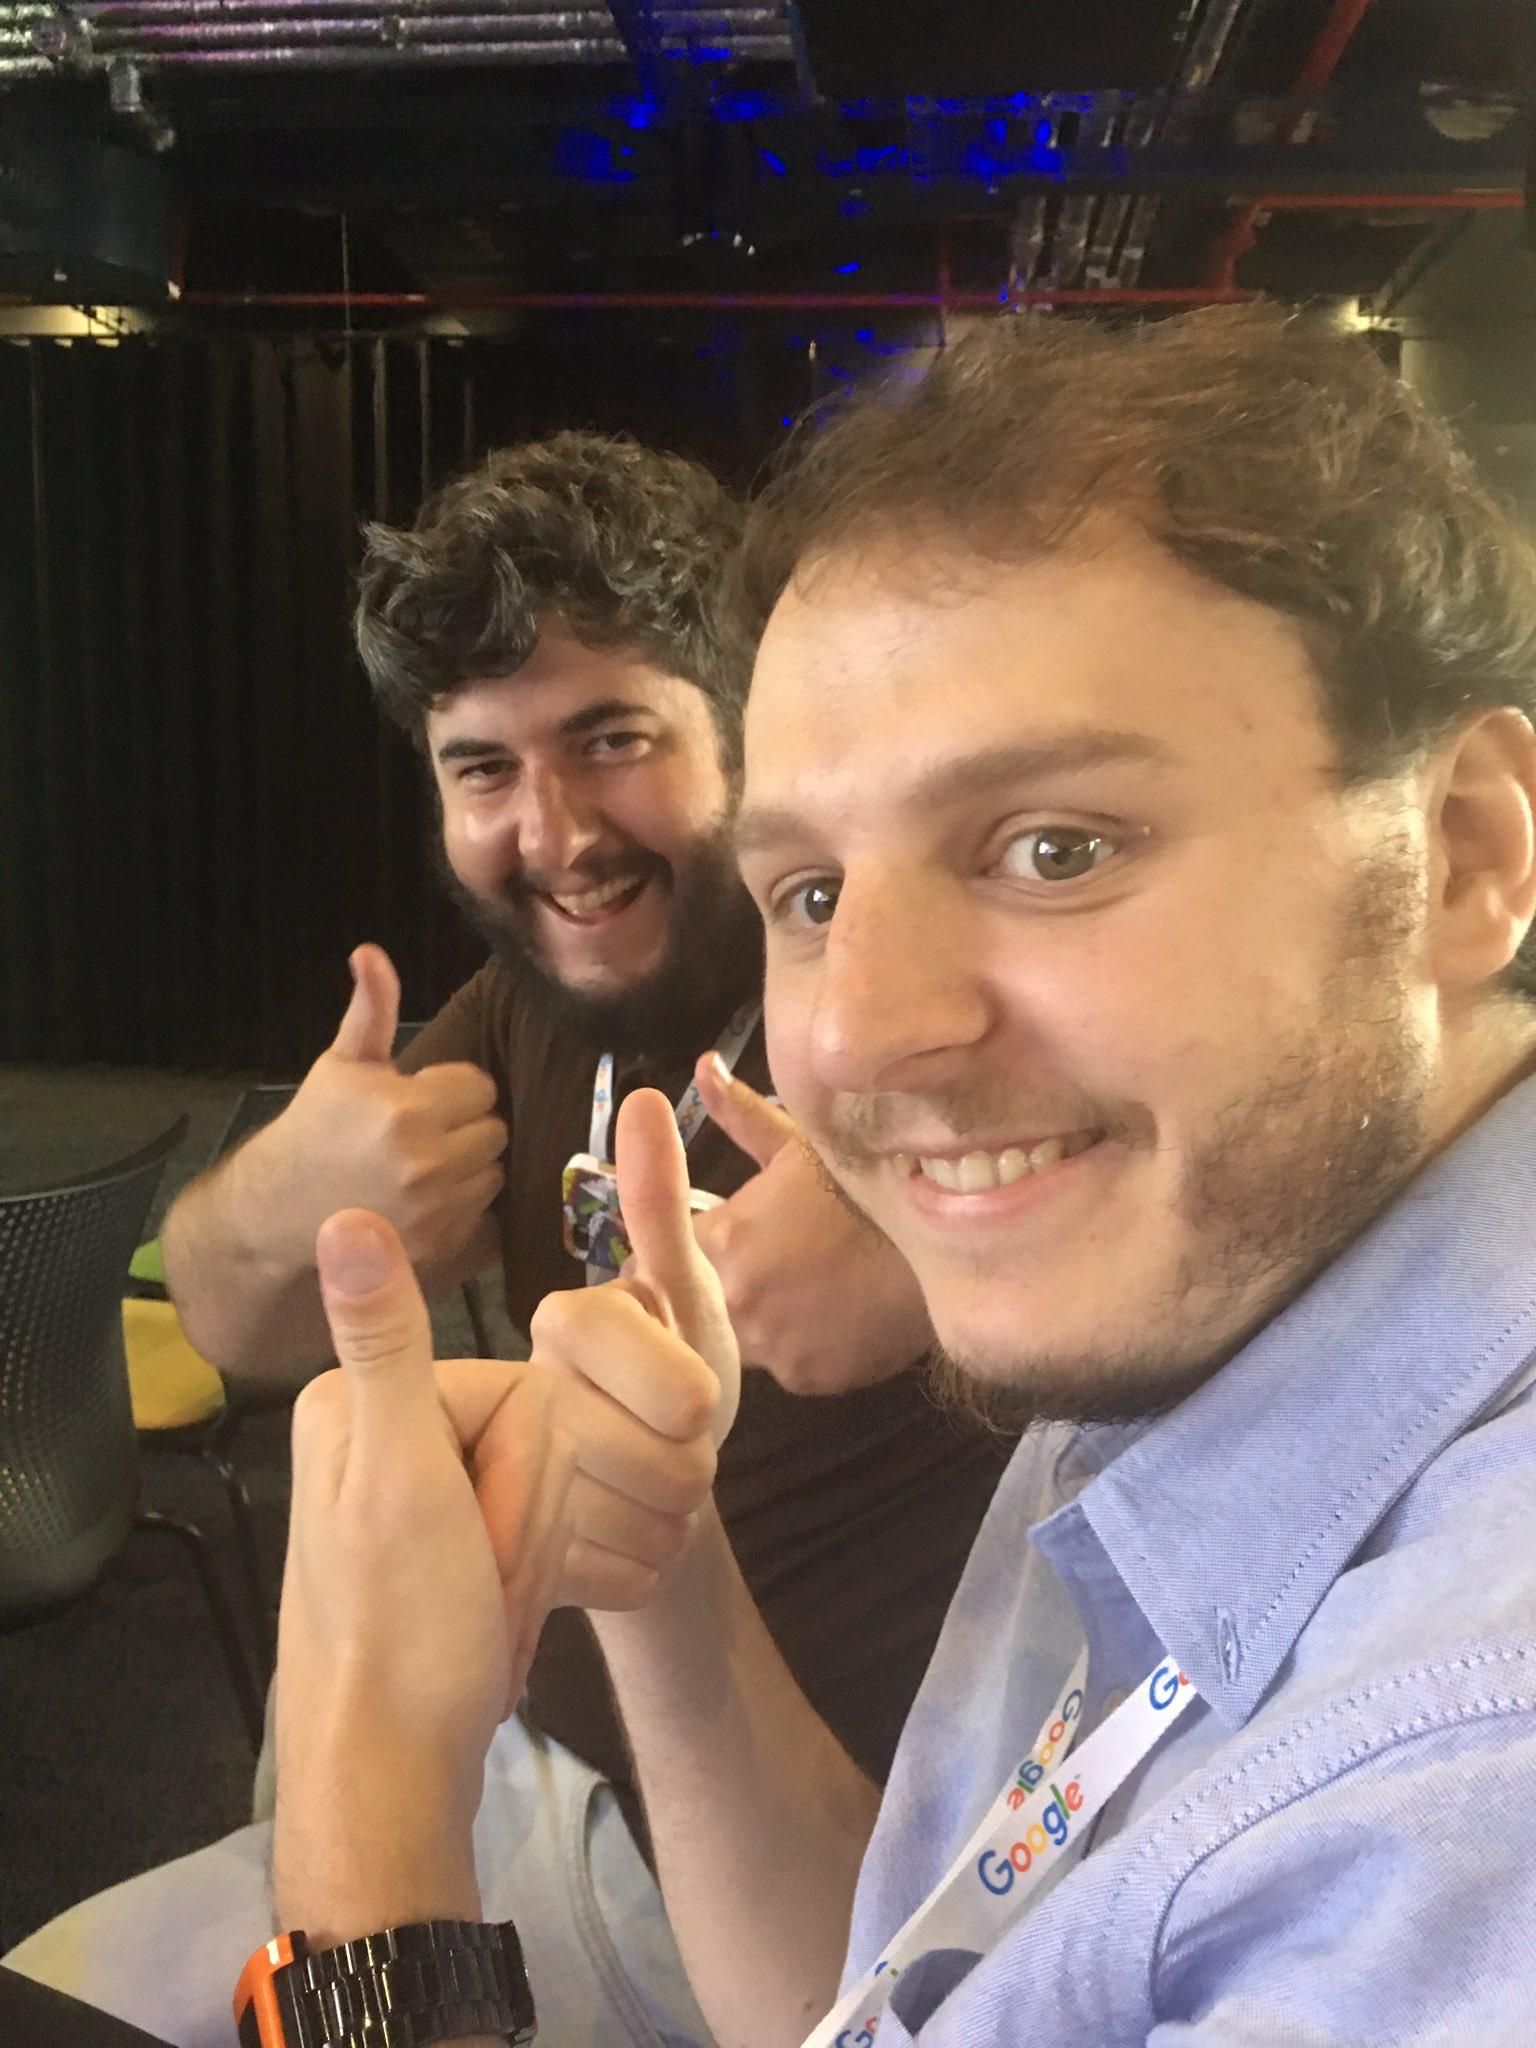 @GoogleForEdu @AppsEvents1 #EDUBootcamp16 We made it, @tringschool https://t.co/hsviY1UJqT